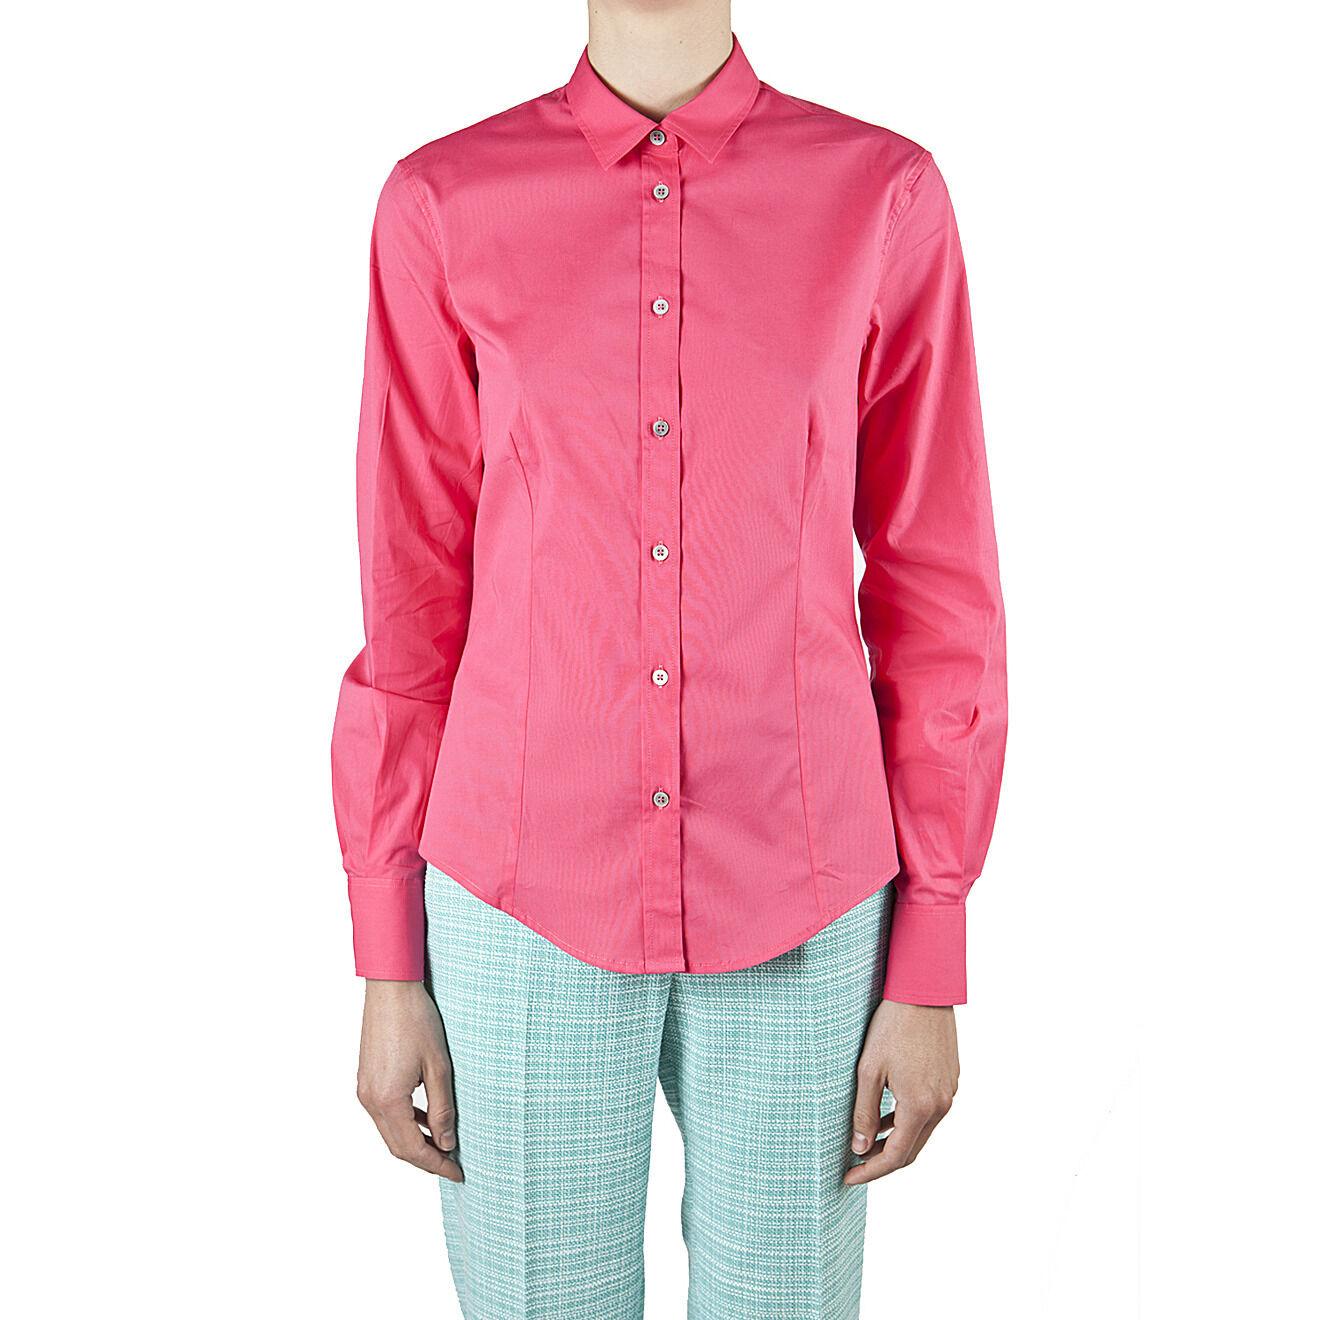 Paul Smith camicia classica polsini rose, classic shirt roses cuff